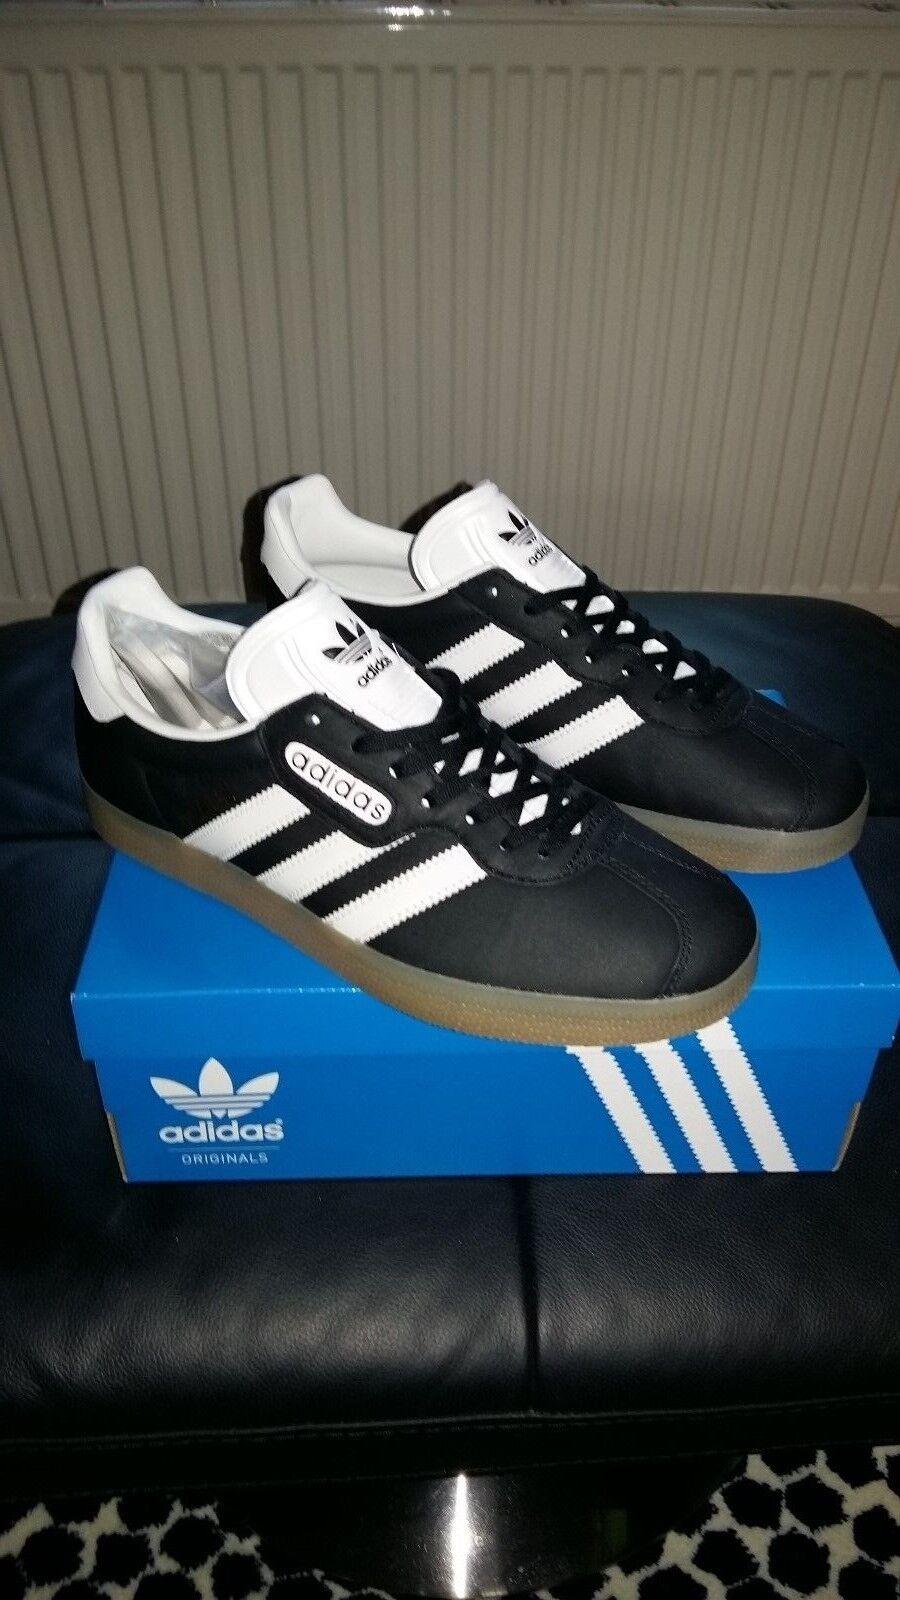 Adidas Gazelle Super Originals.. 7 Terrazas Retro Tenis Talla 7 Originals.. Reino Unido 40 2/3 euros 56ec6f